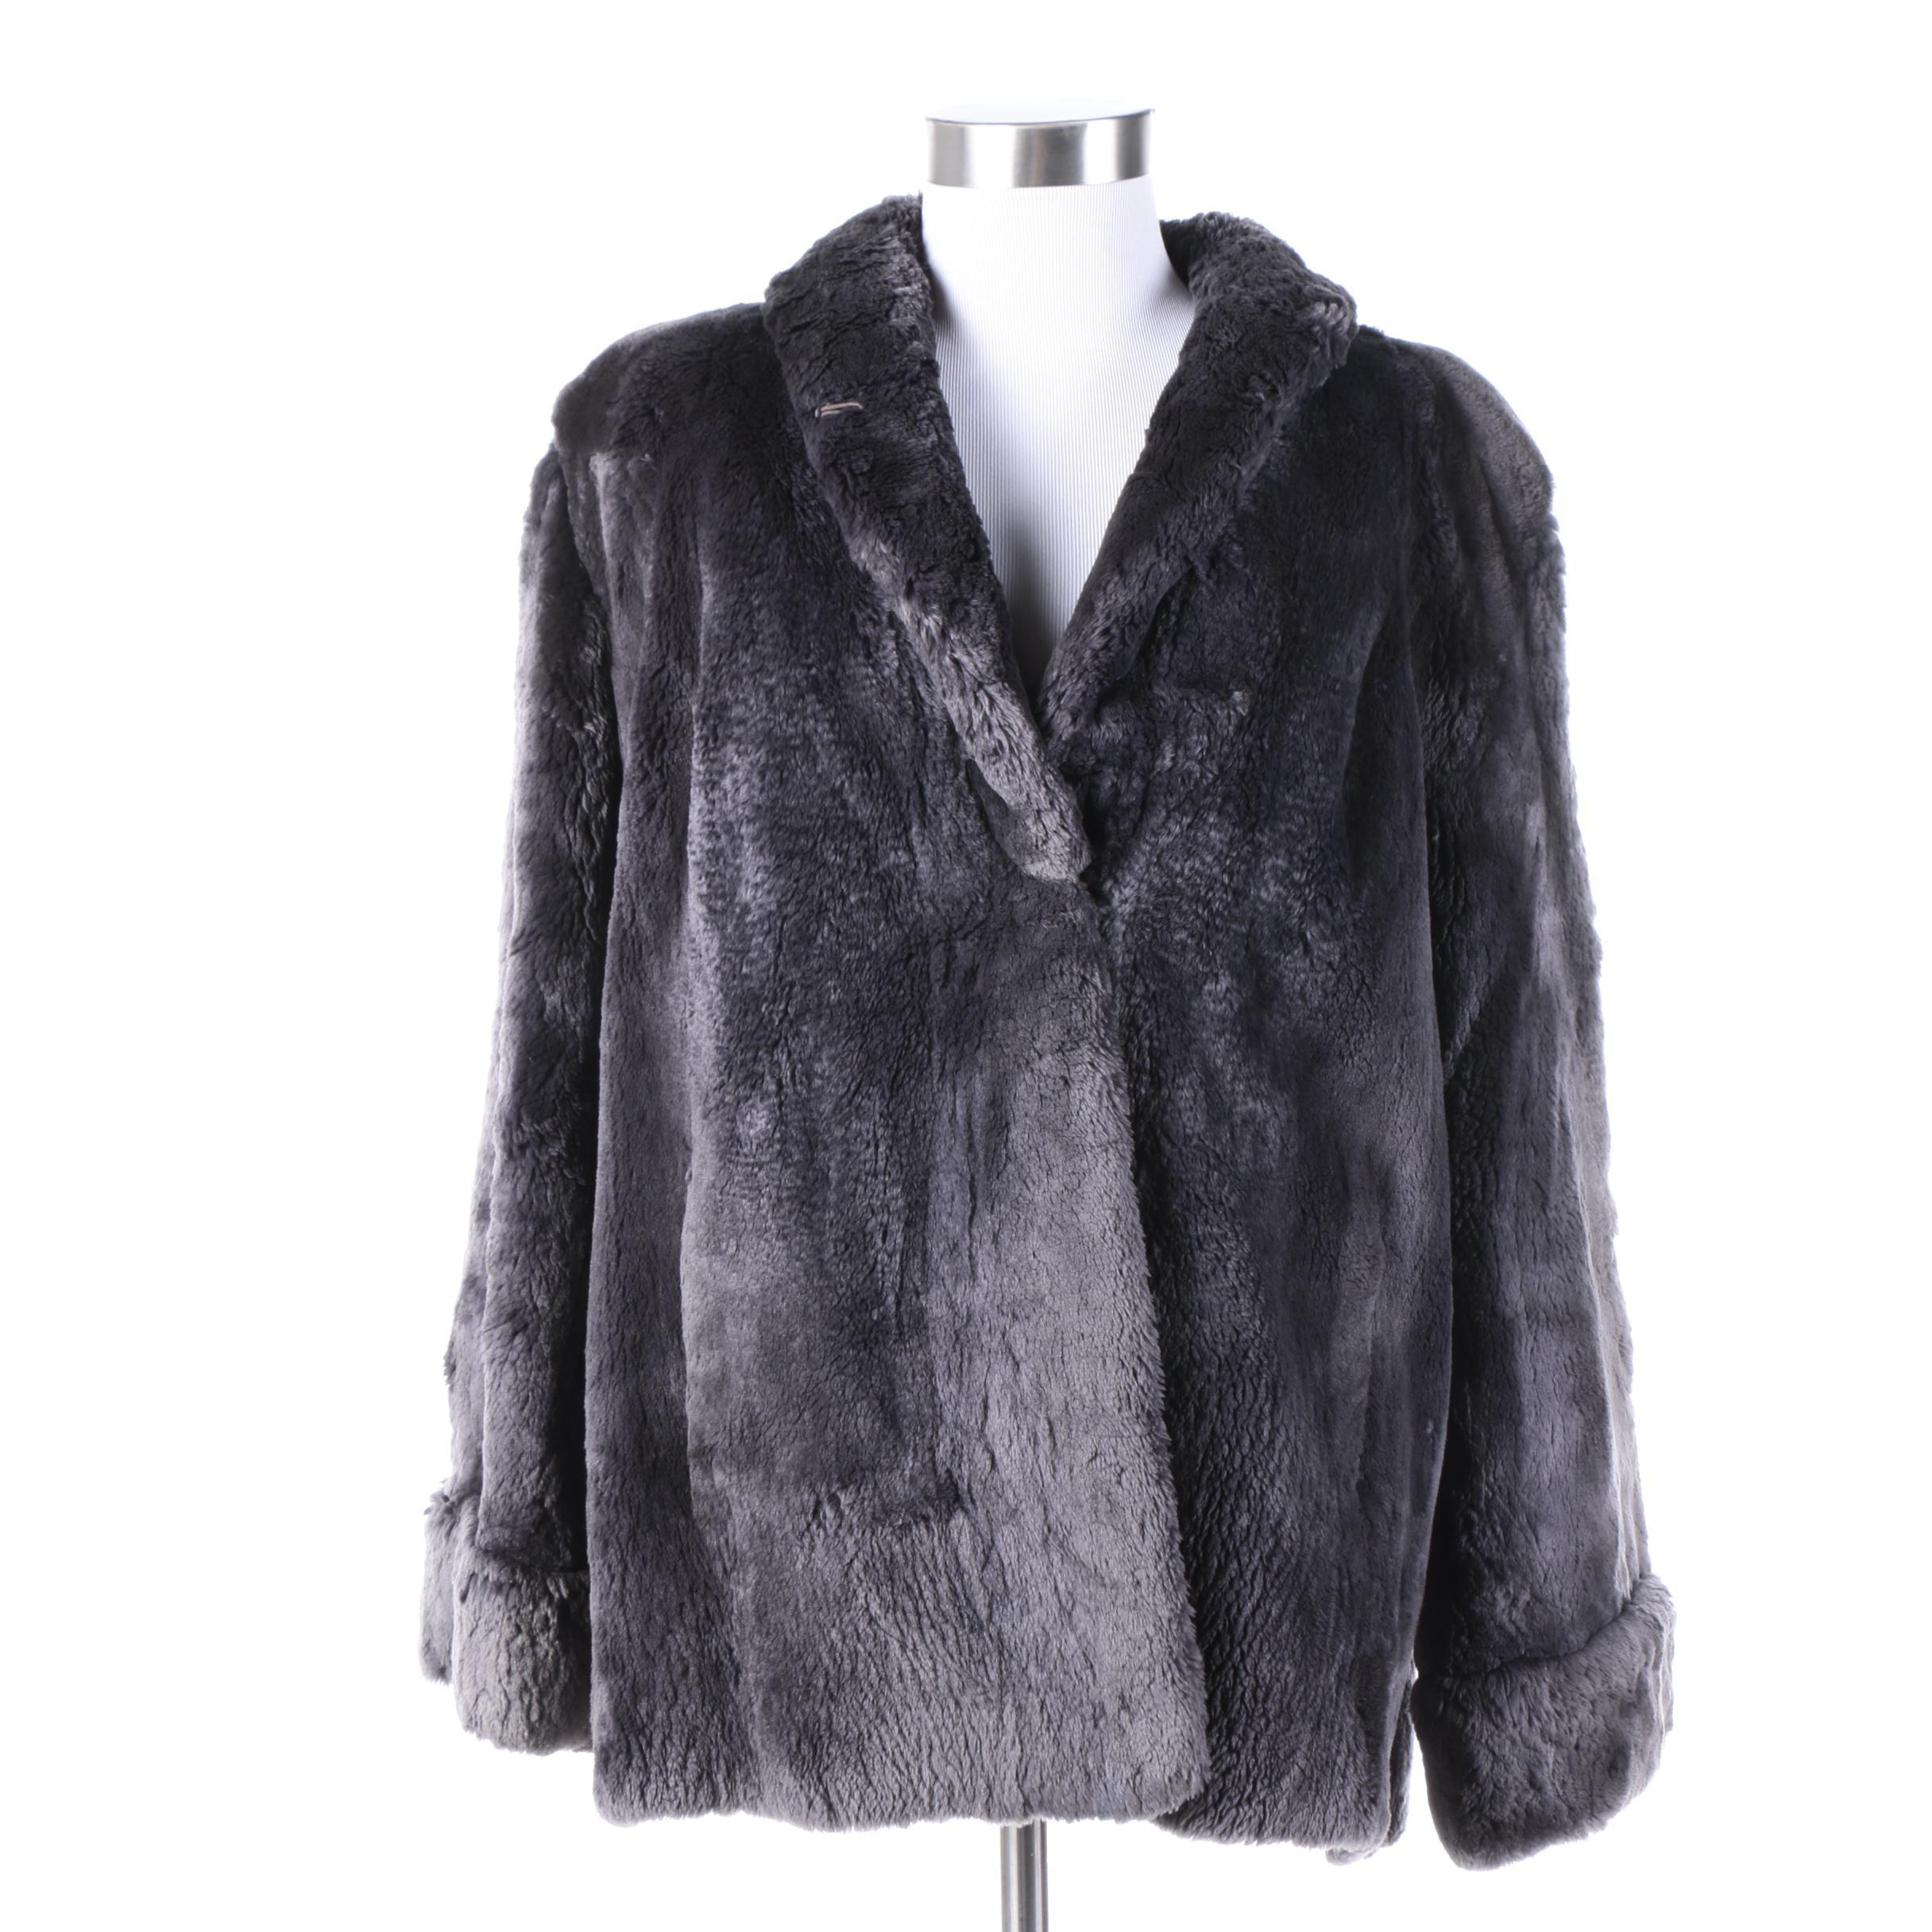 Vintage Duplers Furs Dyed Gray Sheared Beaver Fur Coat